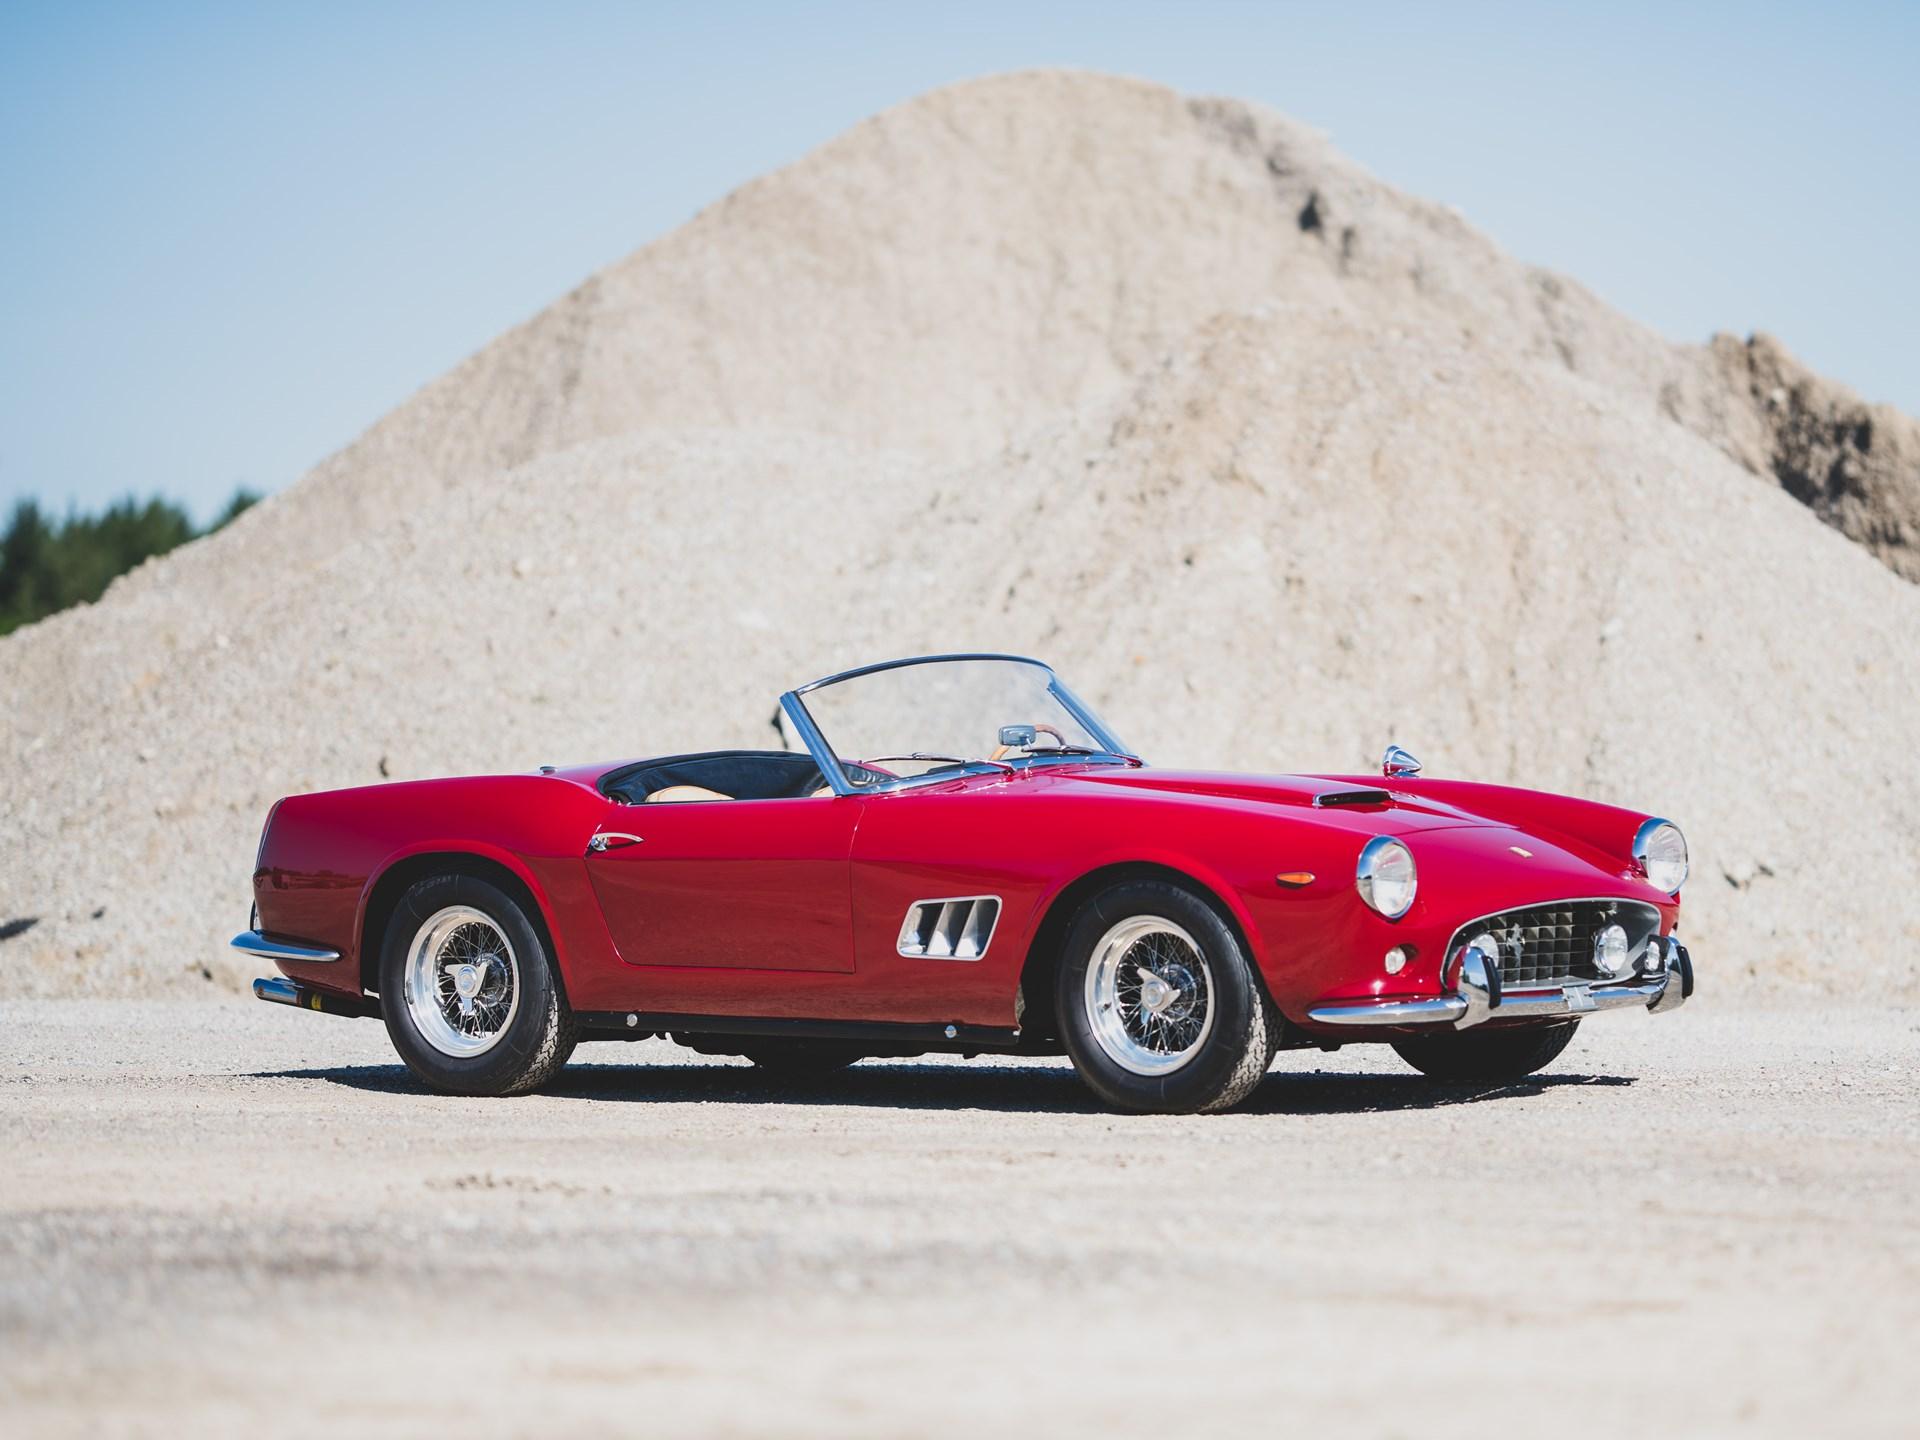 RM Sotheby's - 1962 Ferrari 250 California SWB Spider by ...